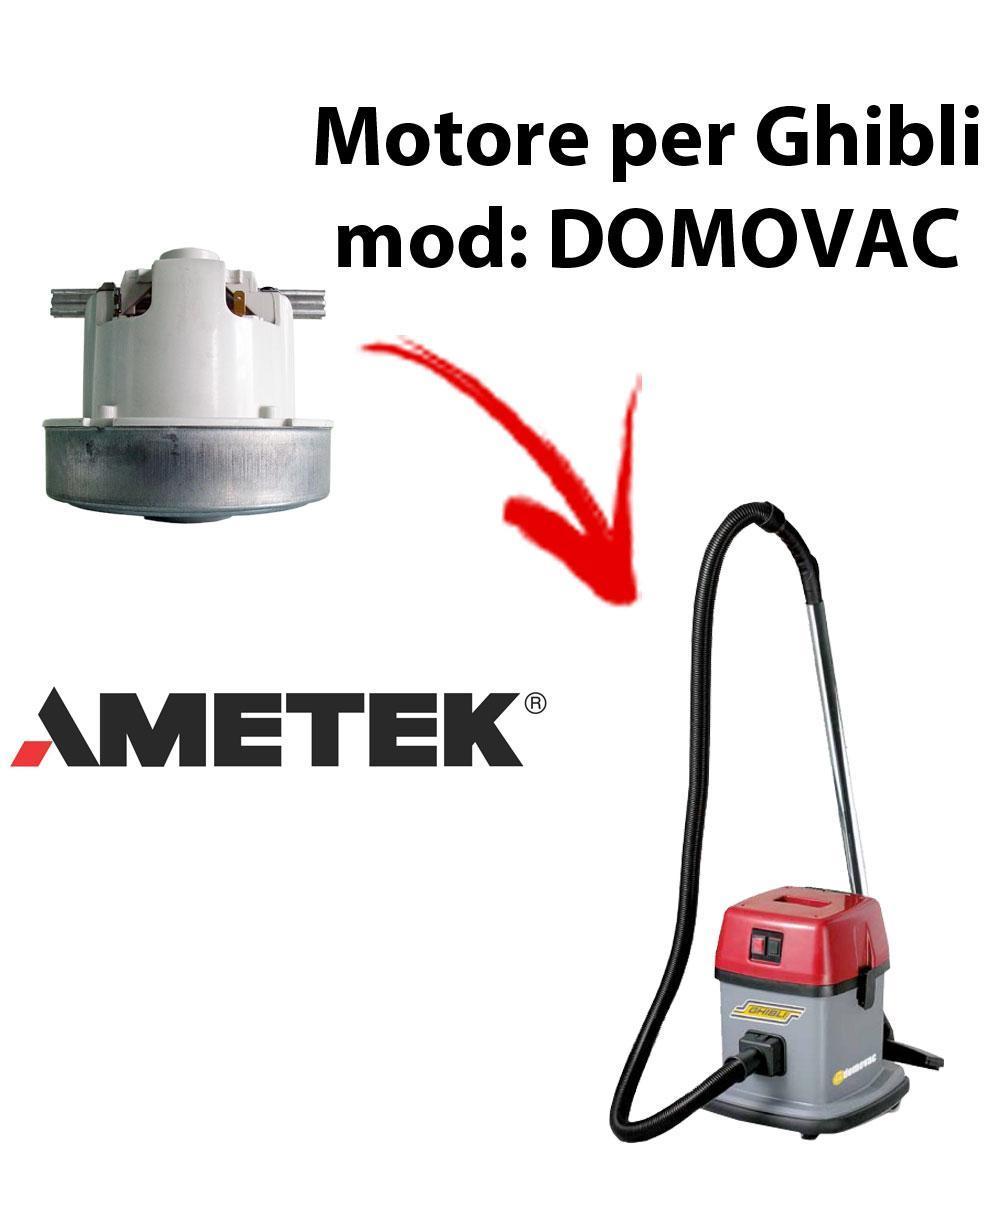 Vacuum Motor Amatek Di Accessories Reaplacement Spare Parts O For Vacuum Cleaner Ghibli Model